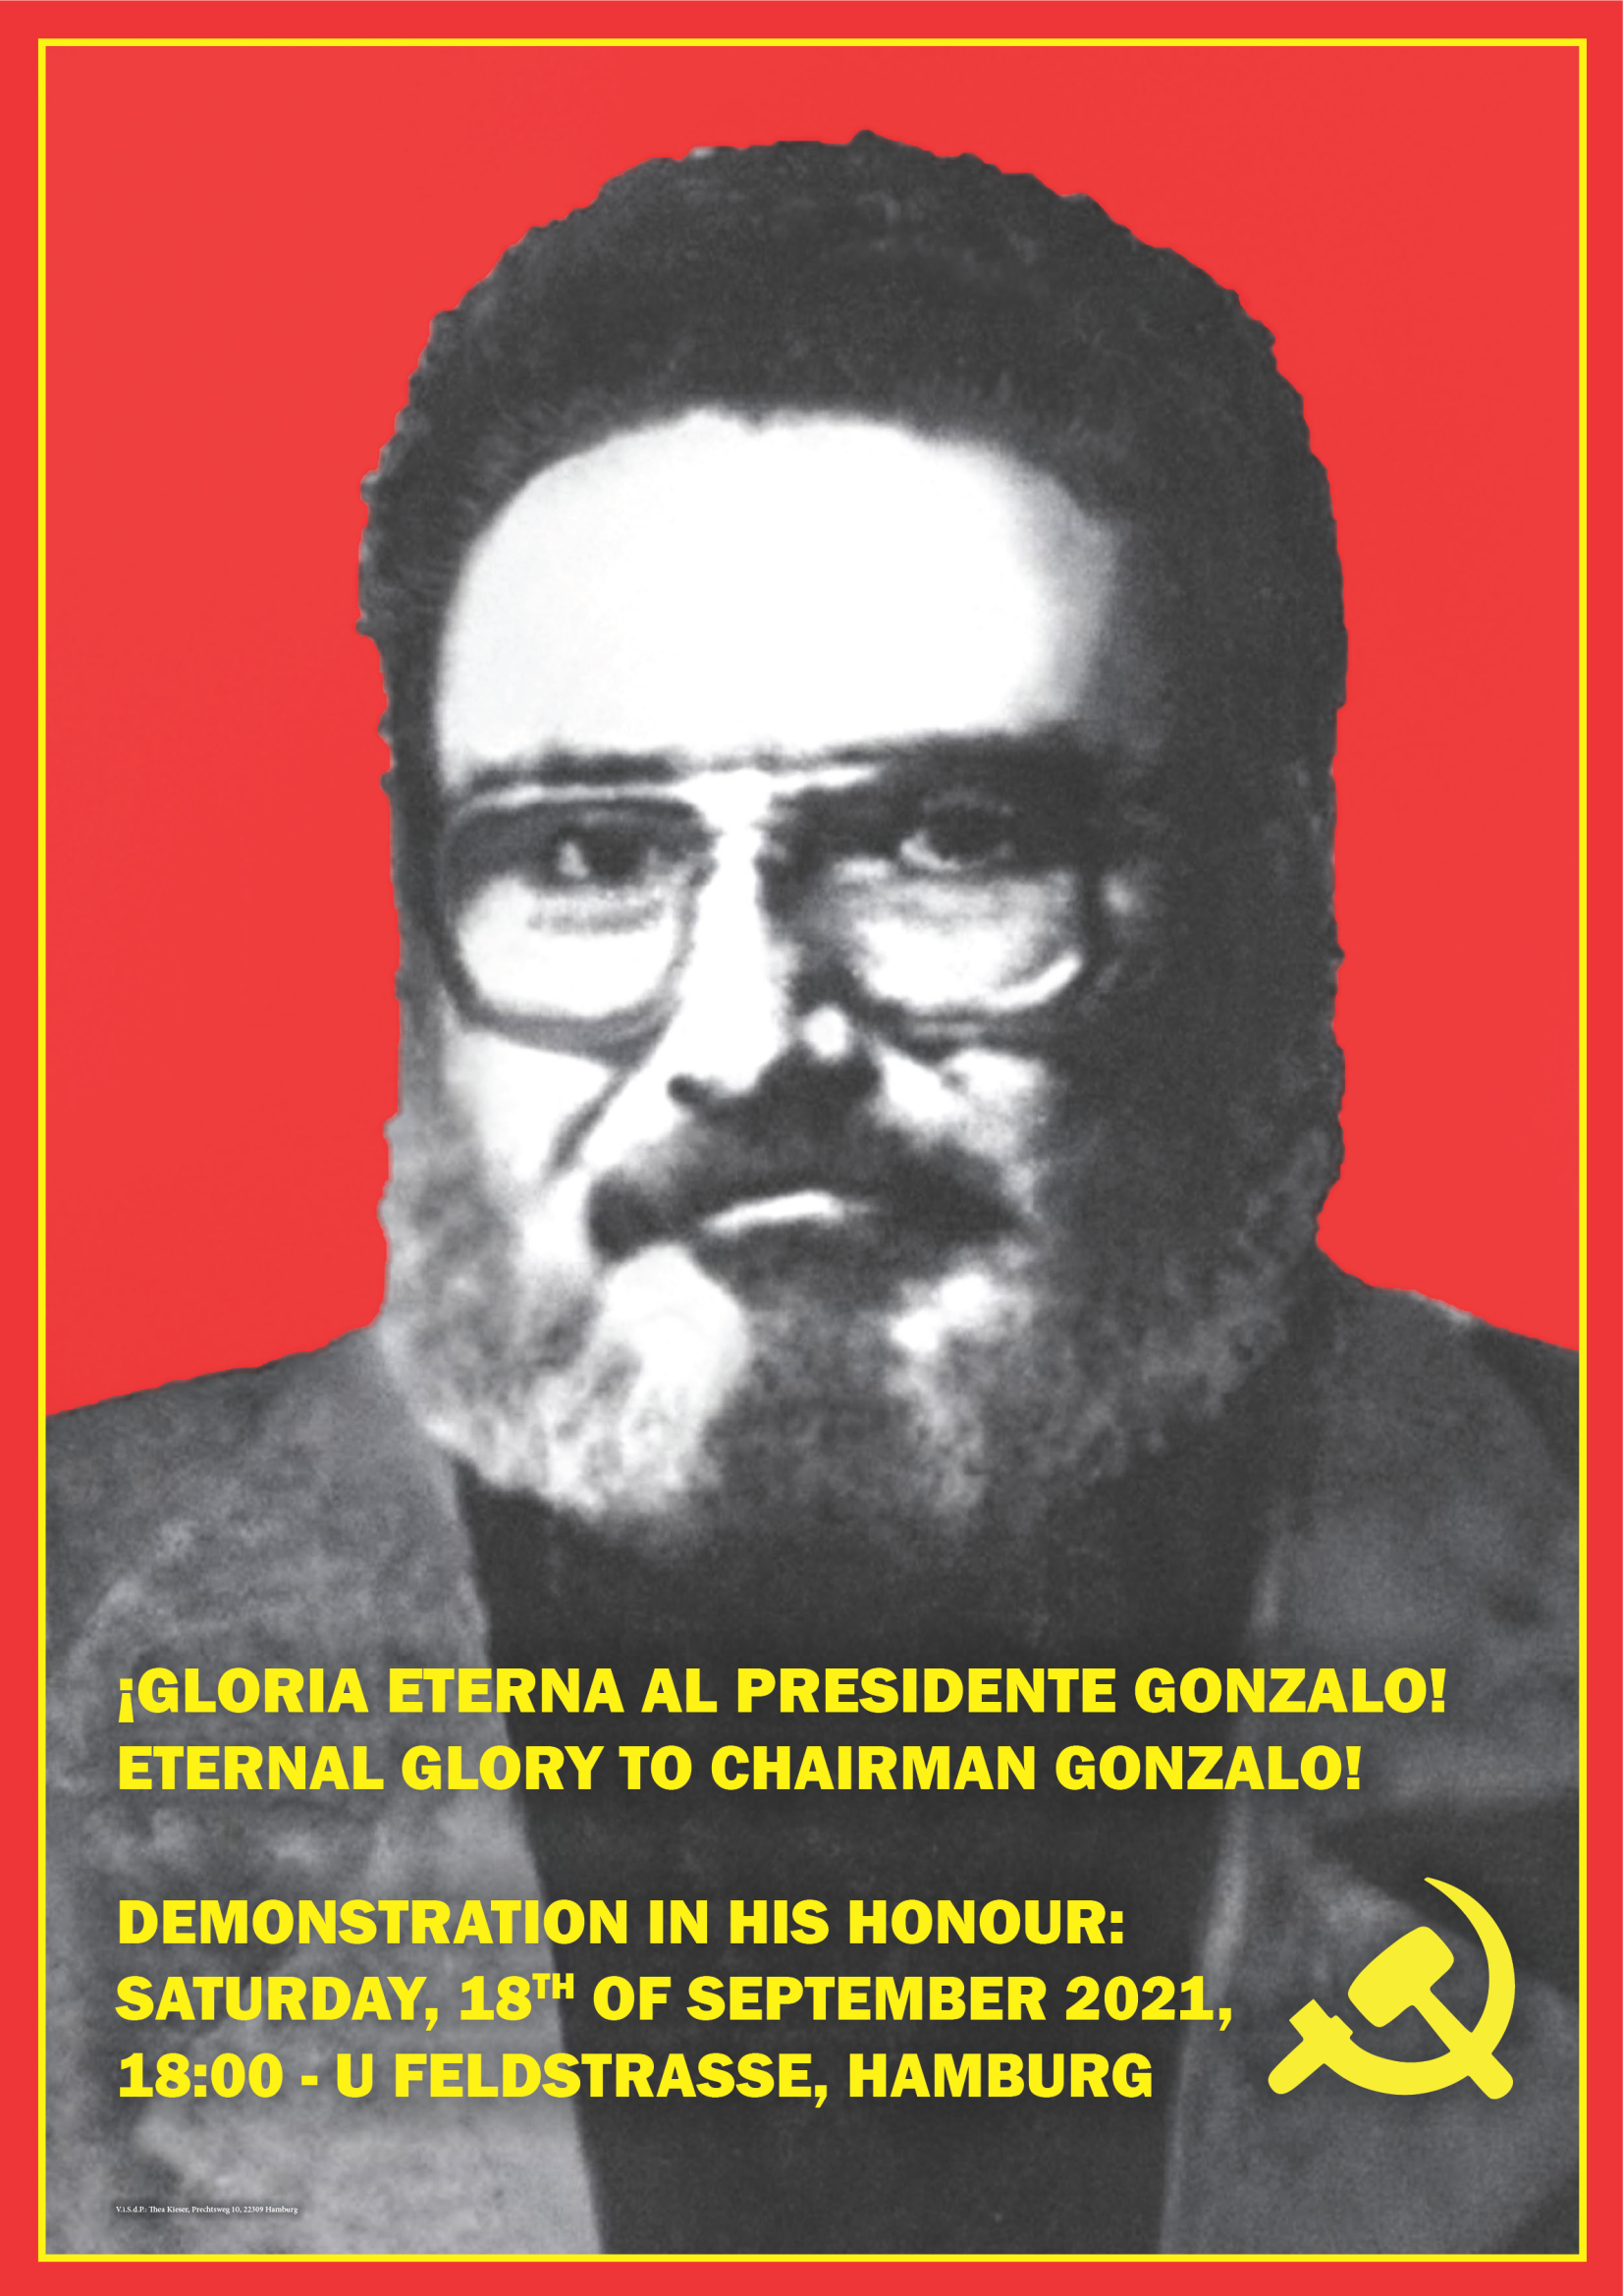 ETERNAL GLORY TO CHAIRMAN GONZALO!